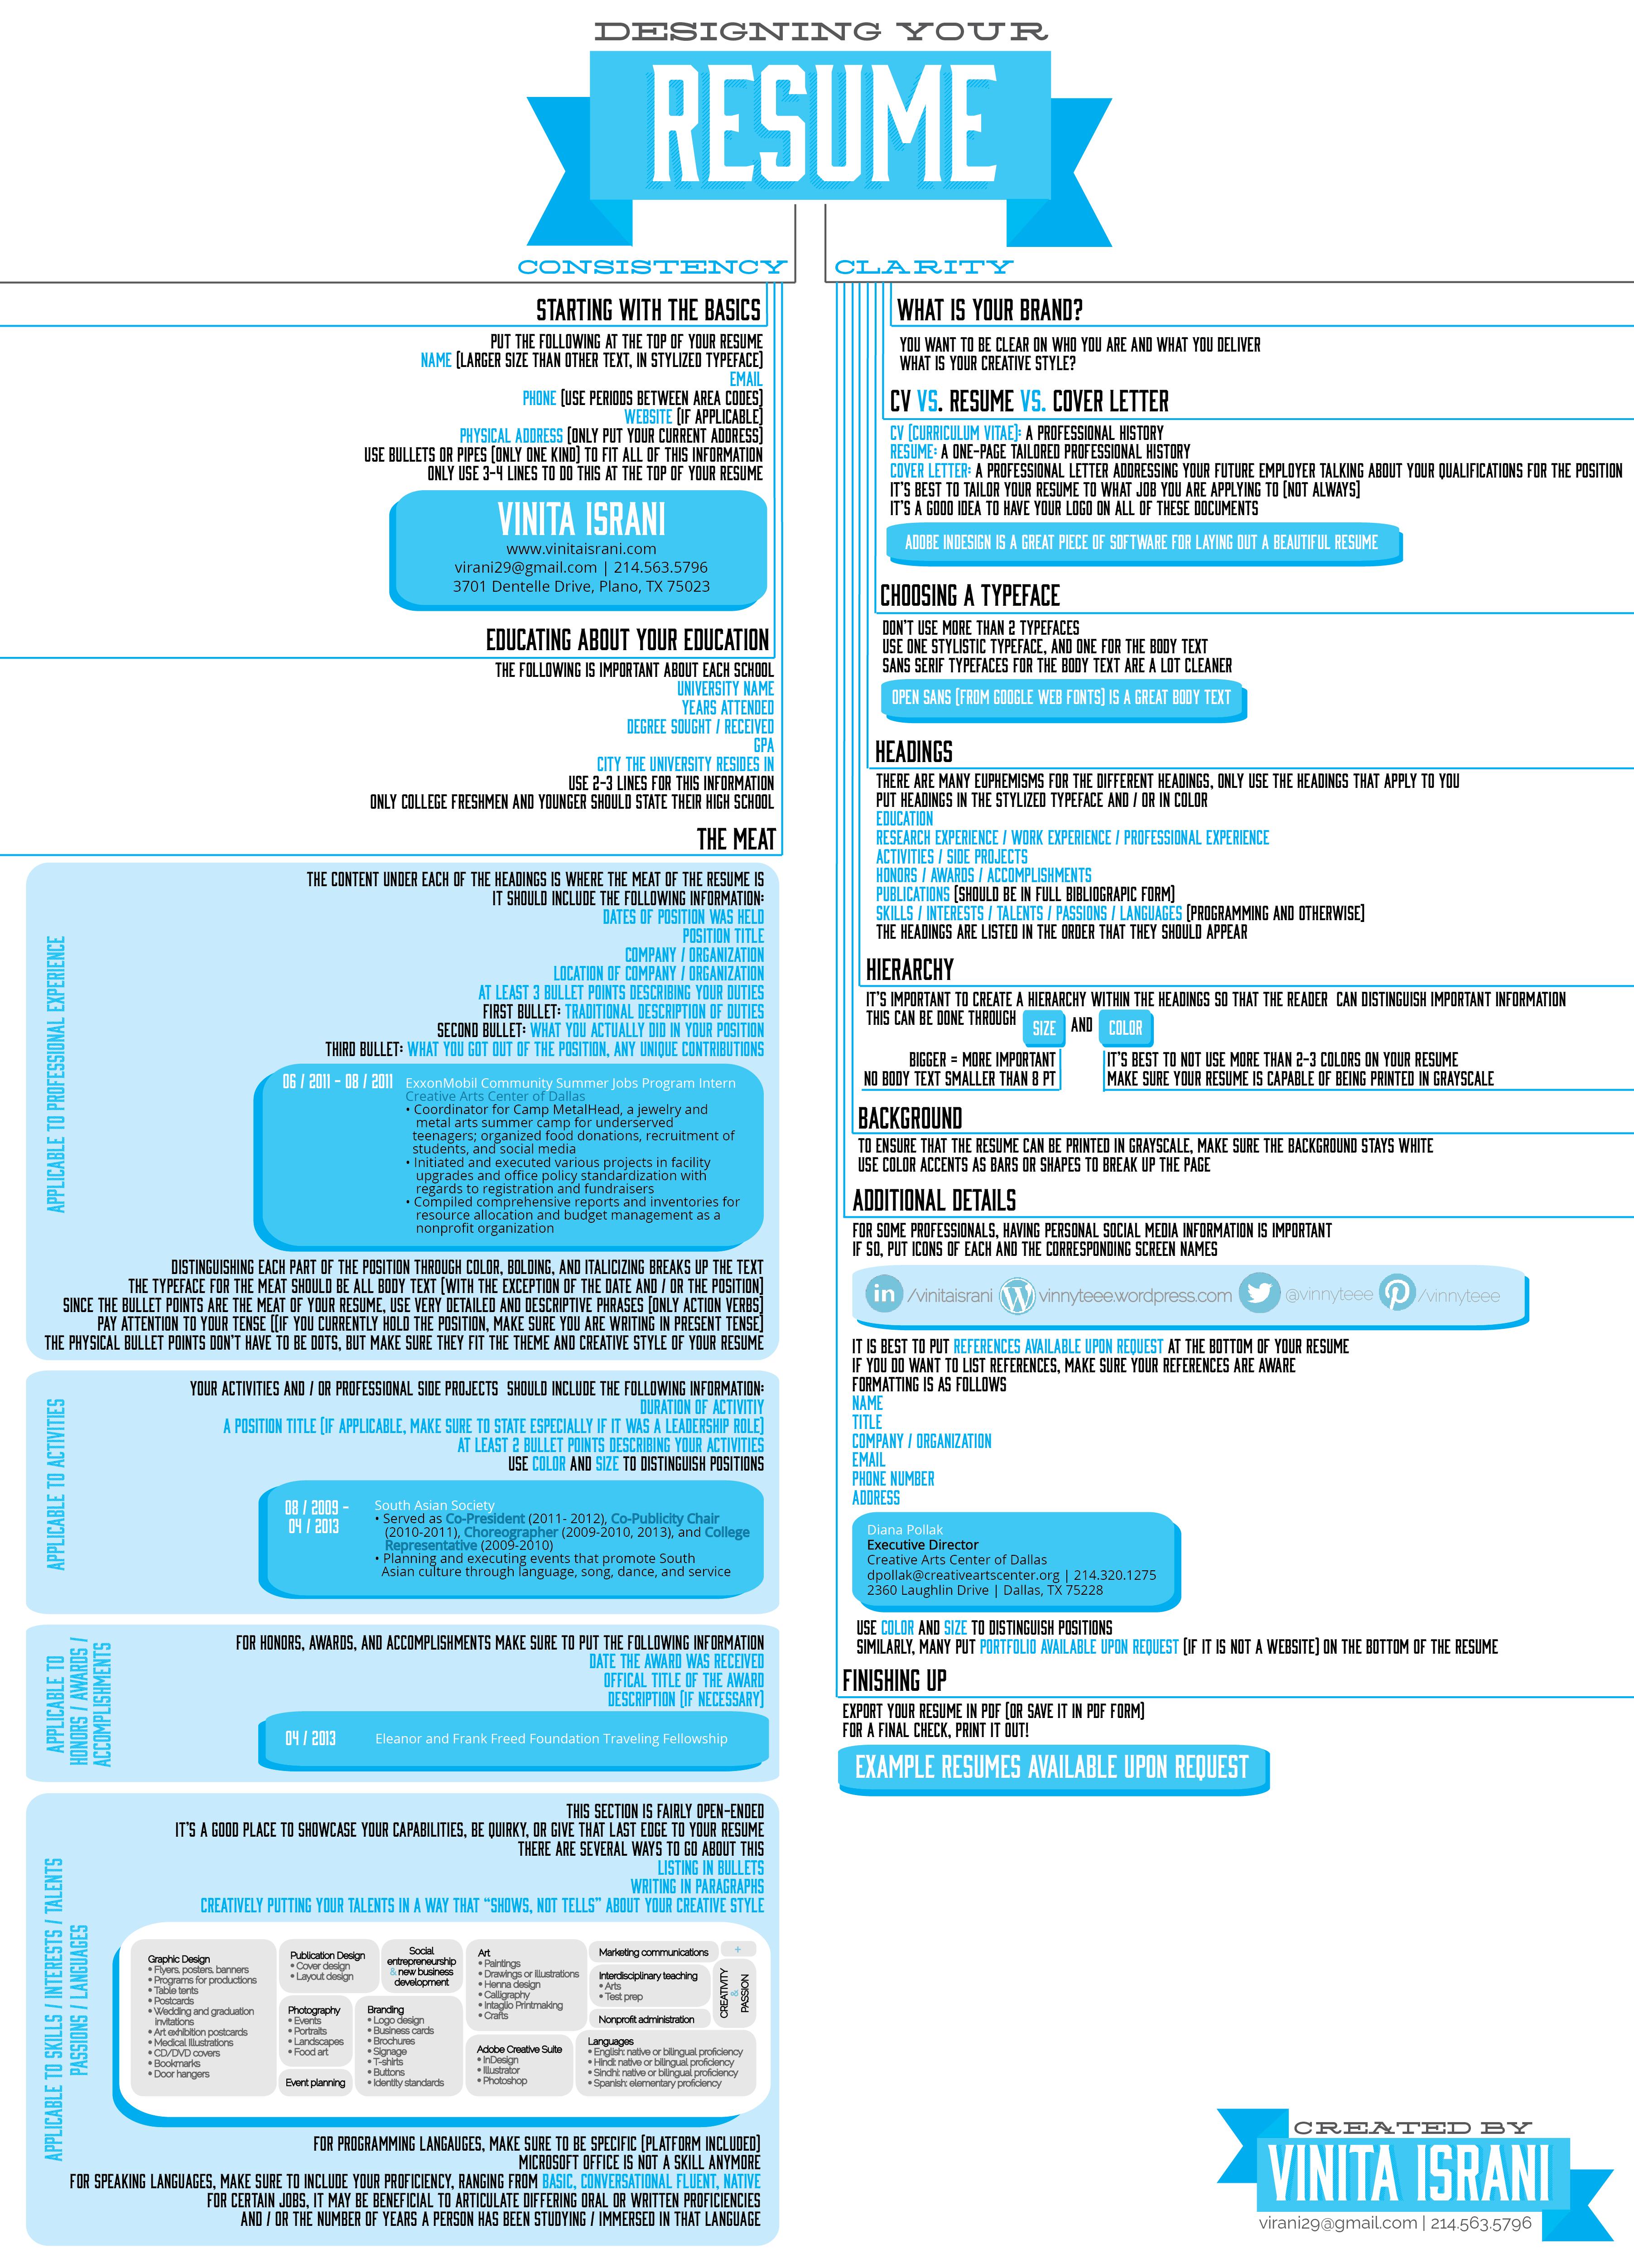 Designing your Resume-01